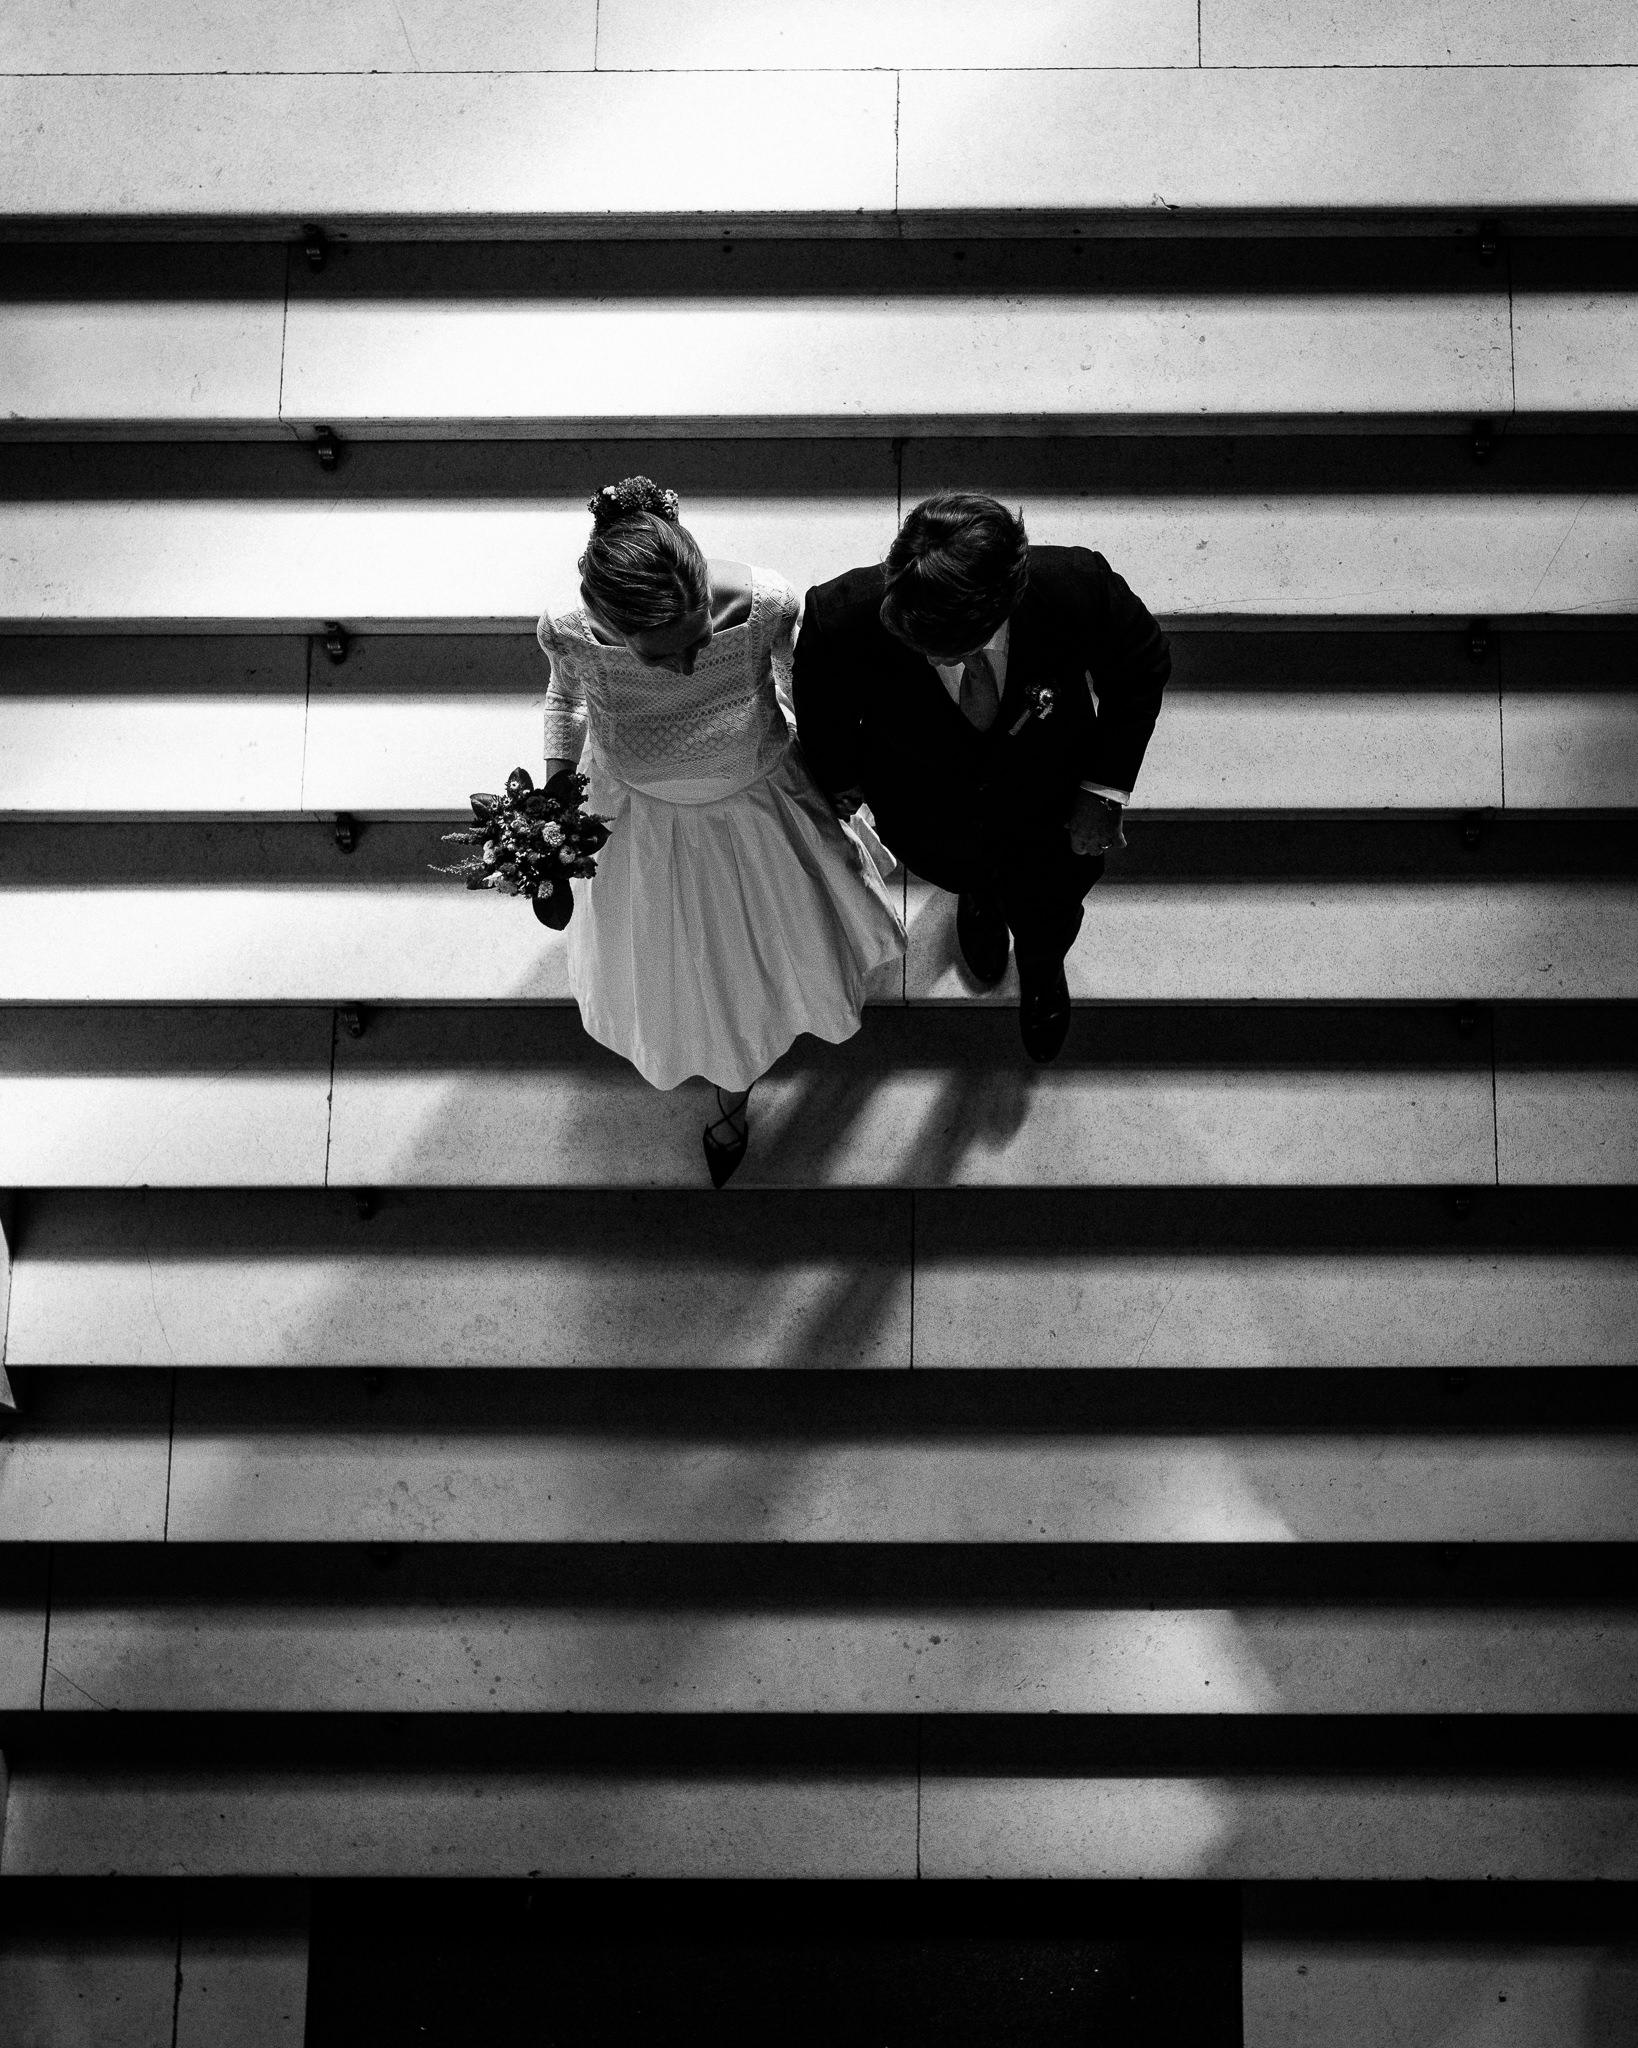 Wedding-Claudia&Philipp-15092018-small-87.jpg